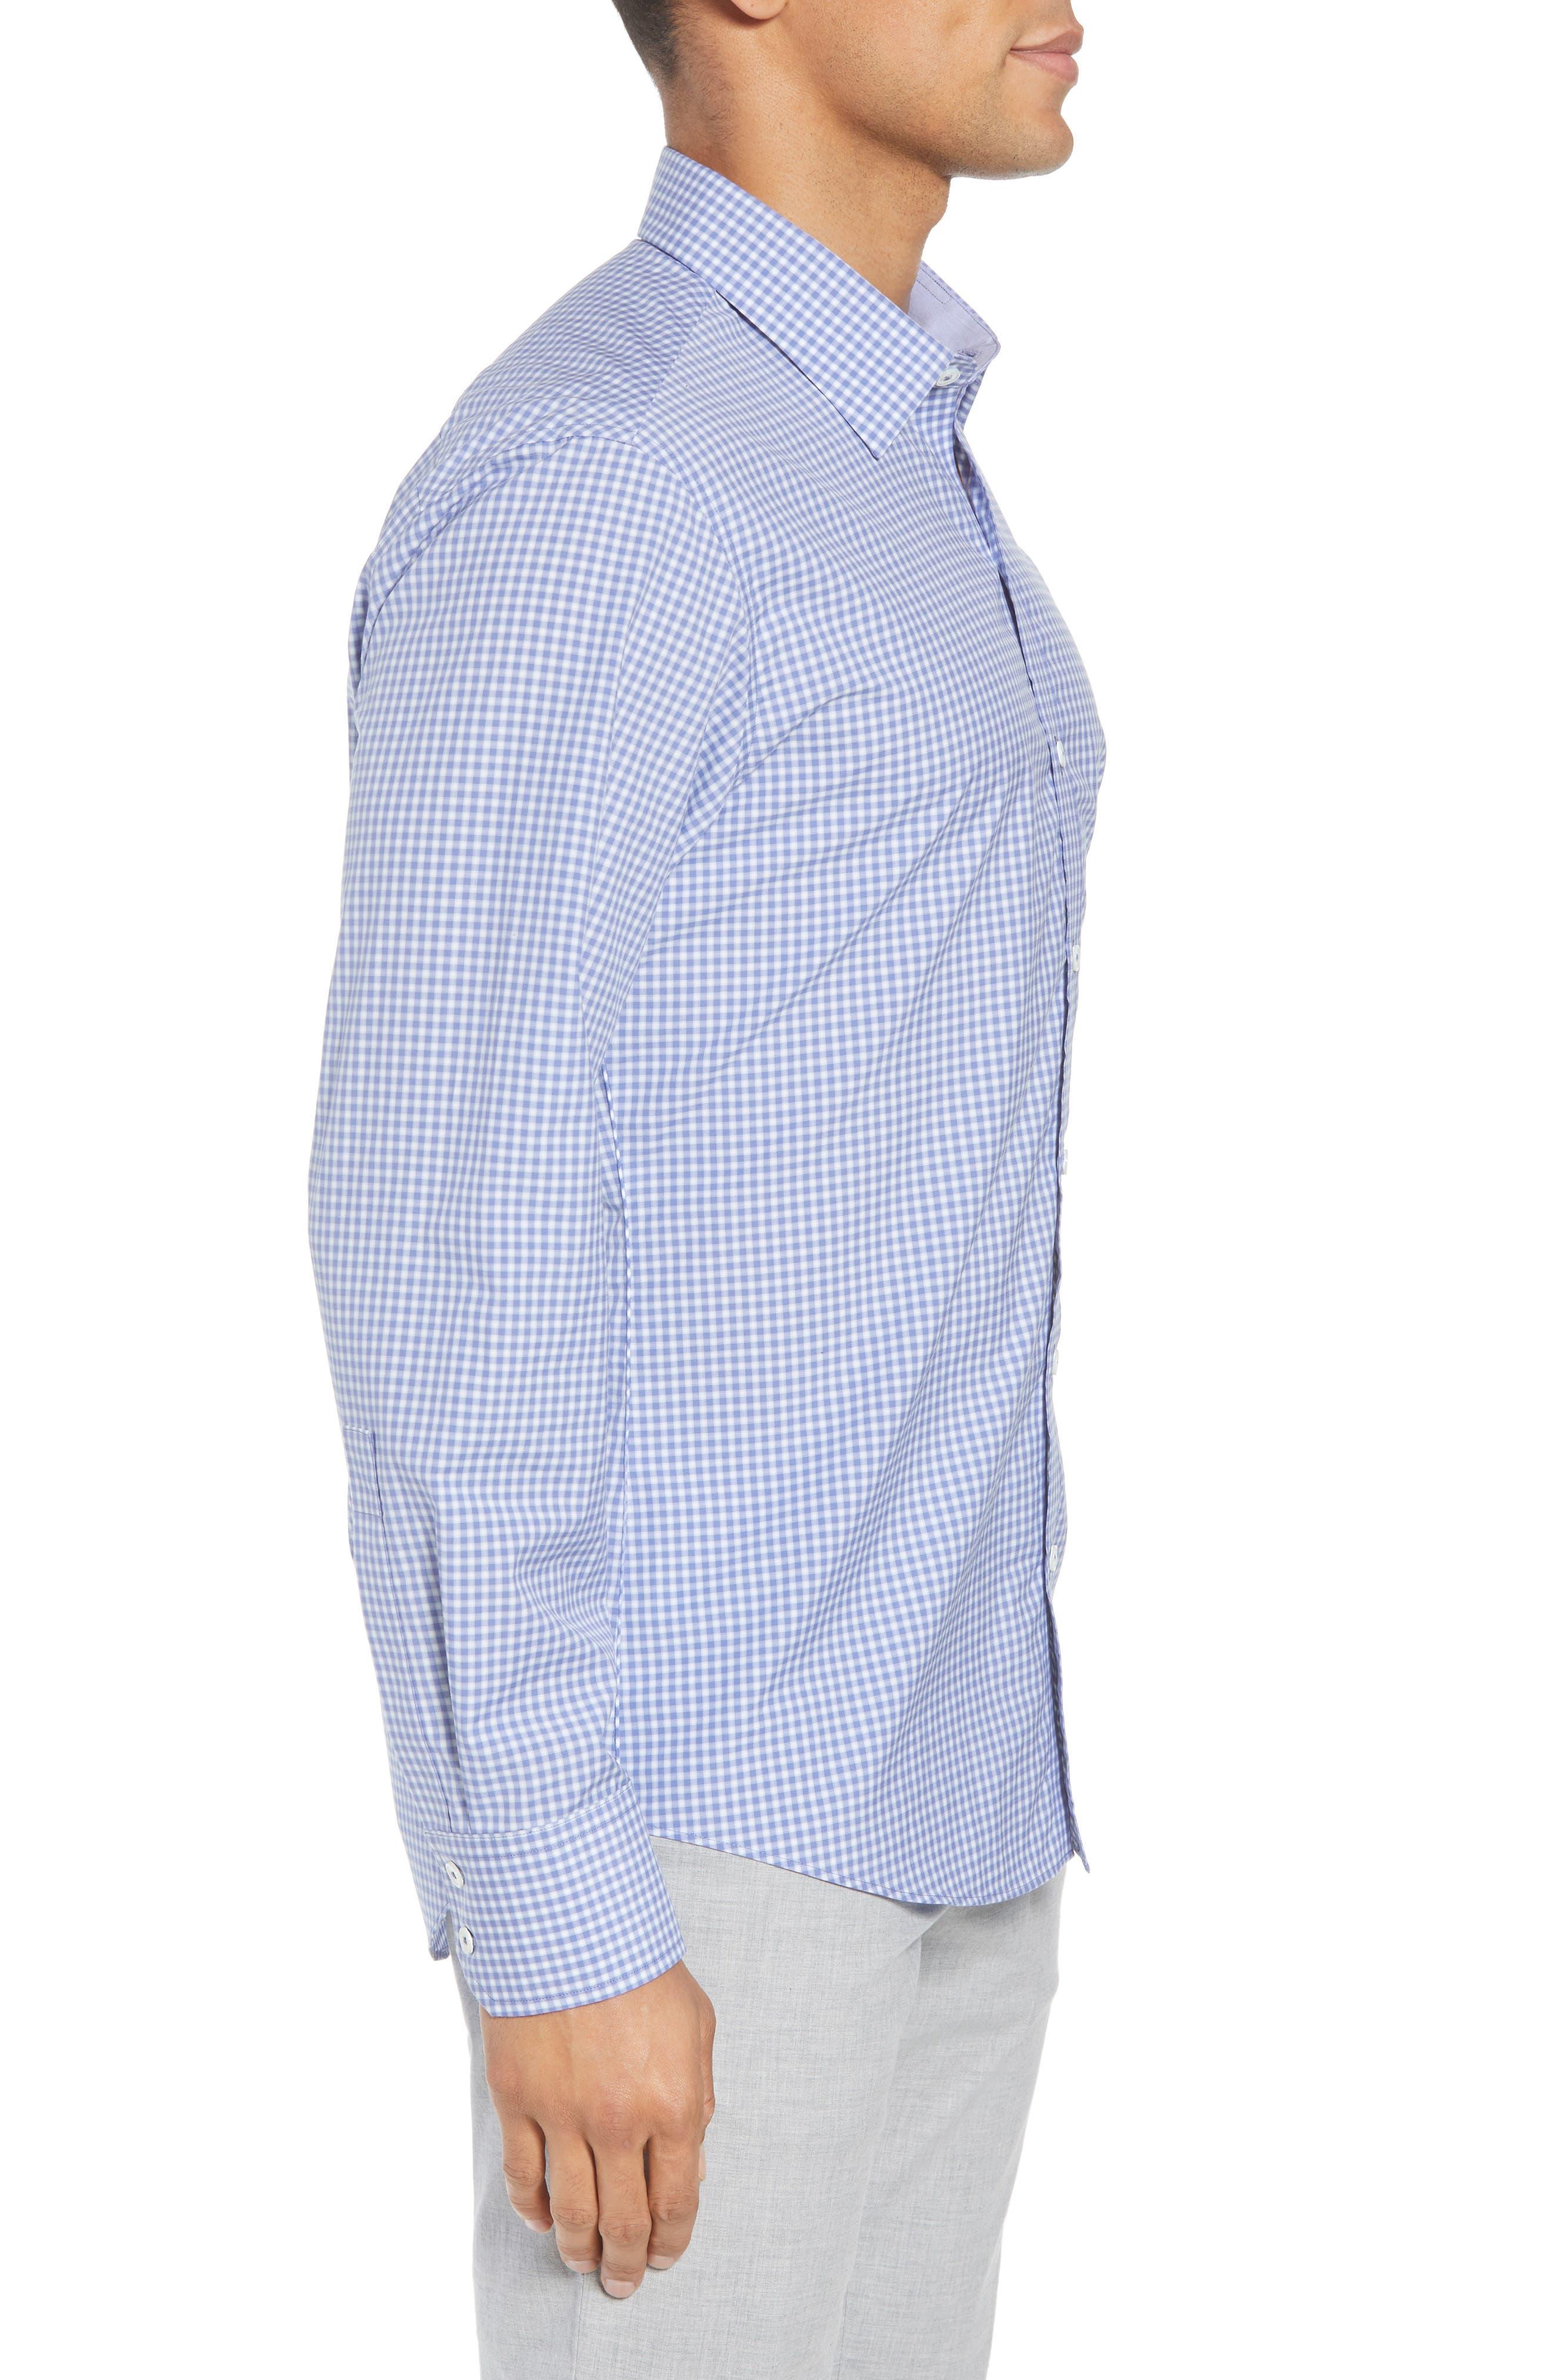 Winston Regular Fit Sport Shirt,                             Alternate thumbnail 3, color,                             Ocean